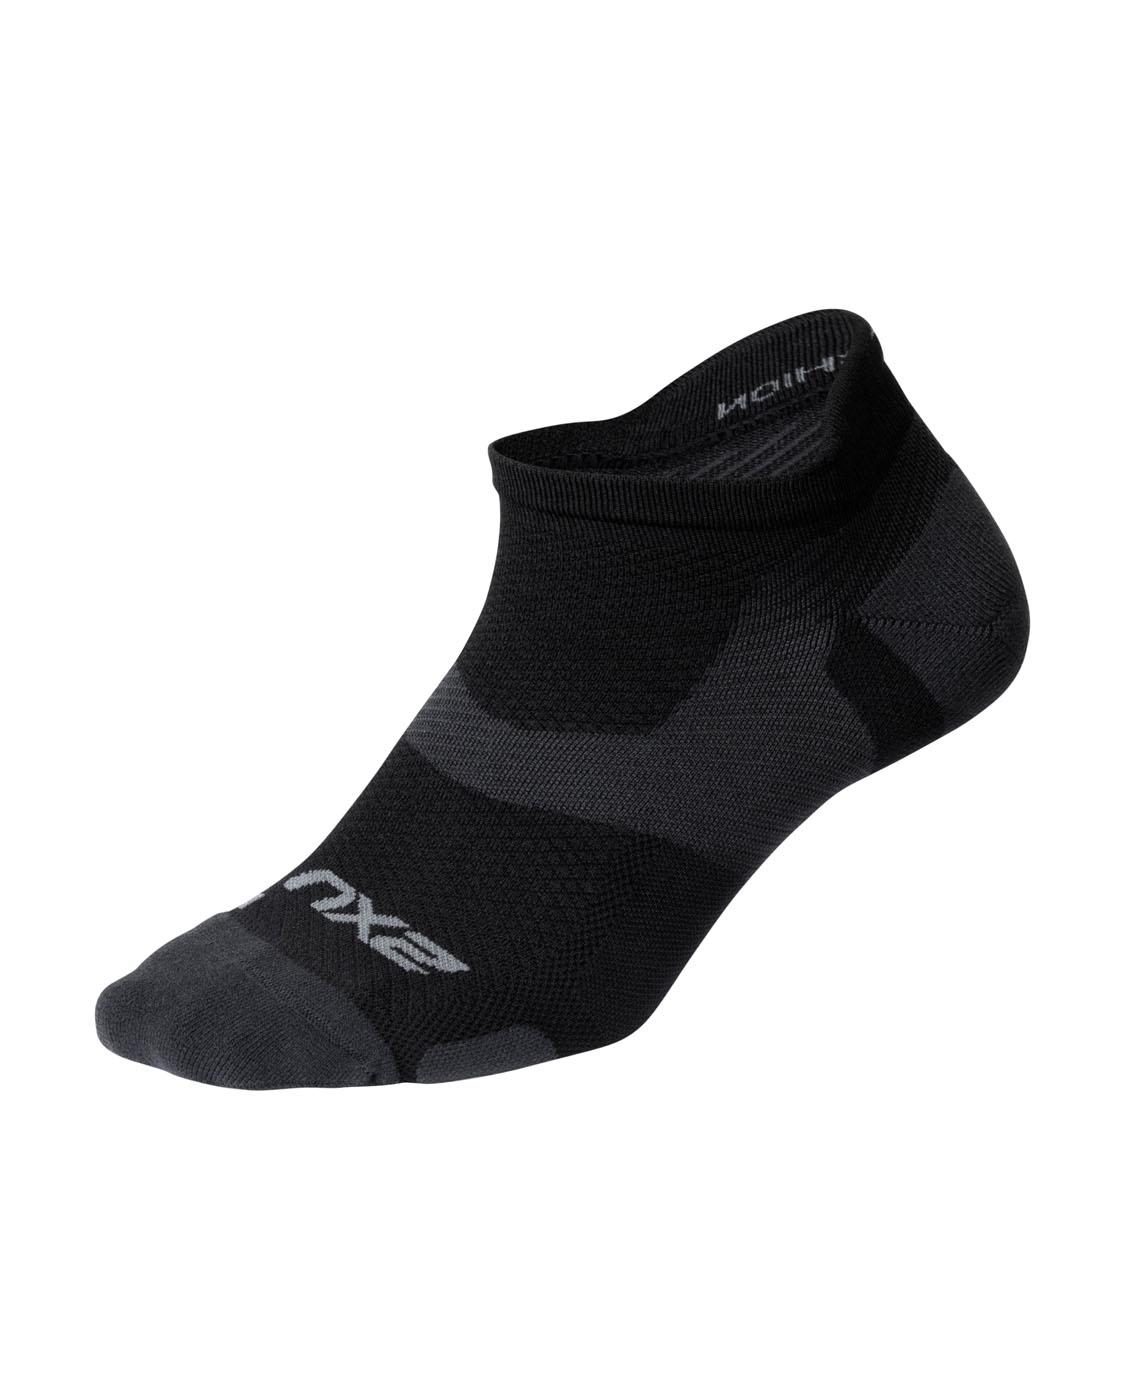 2XU Unisex Vectr LightCushion NoShow Sock - Black/Titanium